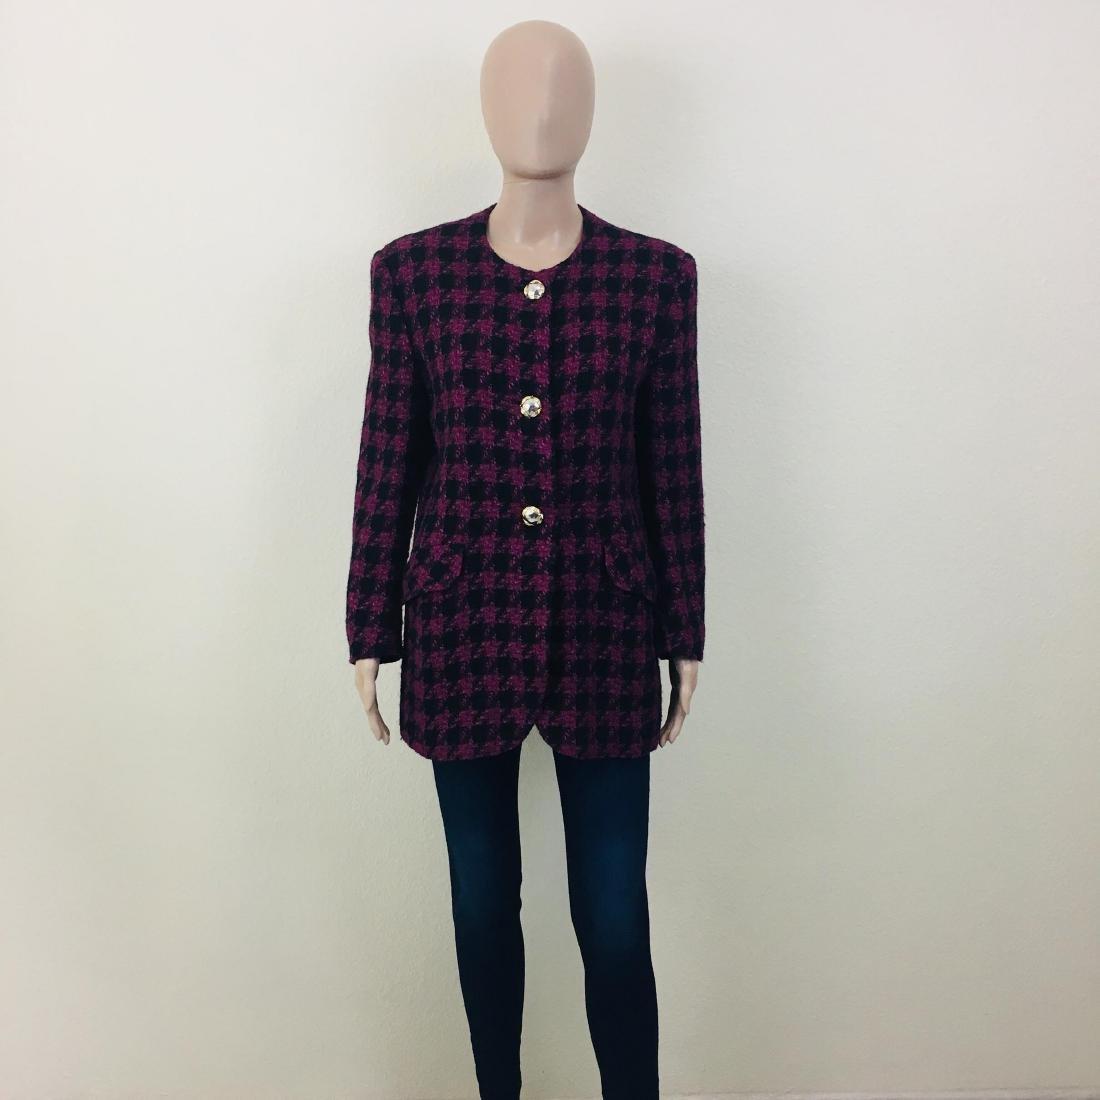 Vintage Women's Uknown Italian Designer Wool Blend - 2